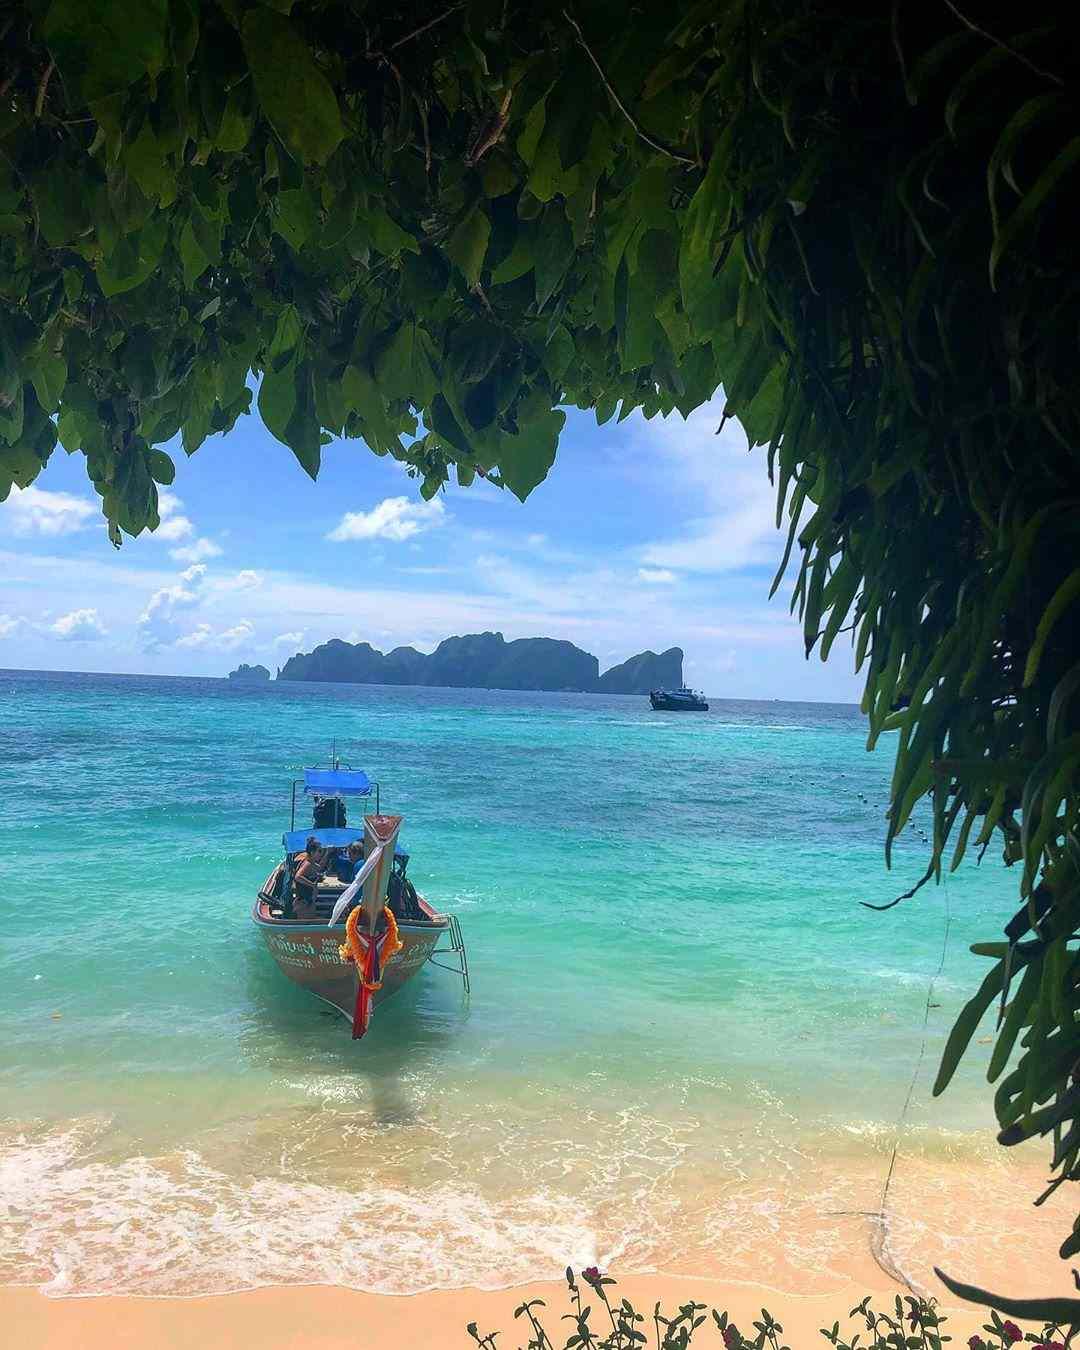 Bootje aan long beach van koh phi phi, thailand